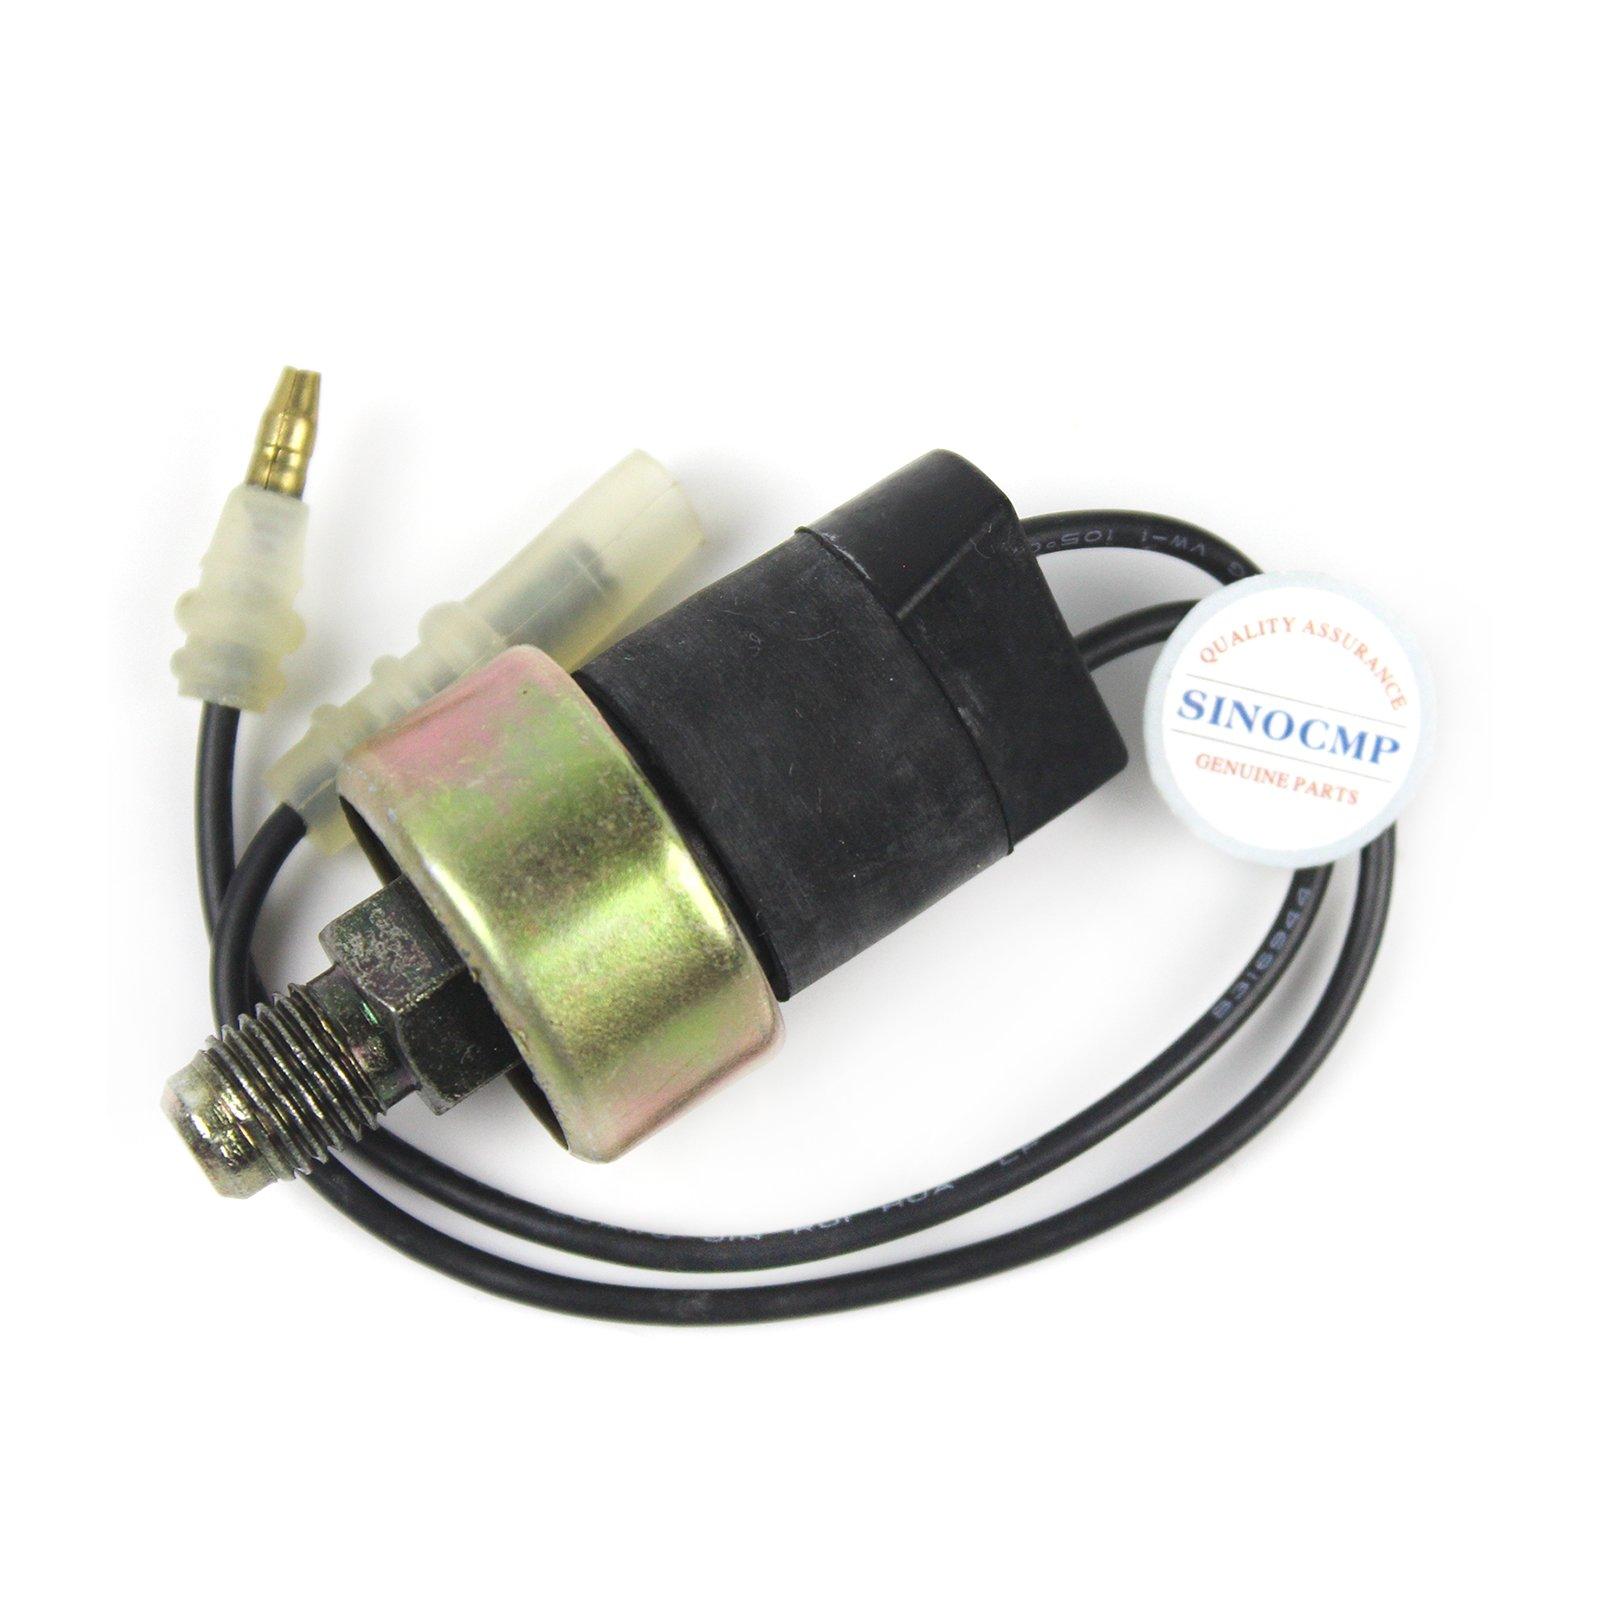 4259333 Pressure Sensor - SINOCMP Excavator Oil Pressure Sensor 4259333 for Hitachi Excavator Parts EX200-2 EX200-3 EX300-3 Parts, 3 Month Warranty by SINOCMP